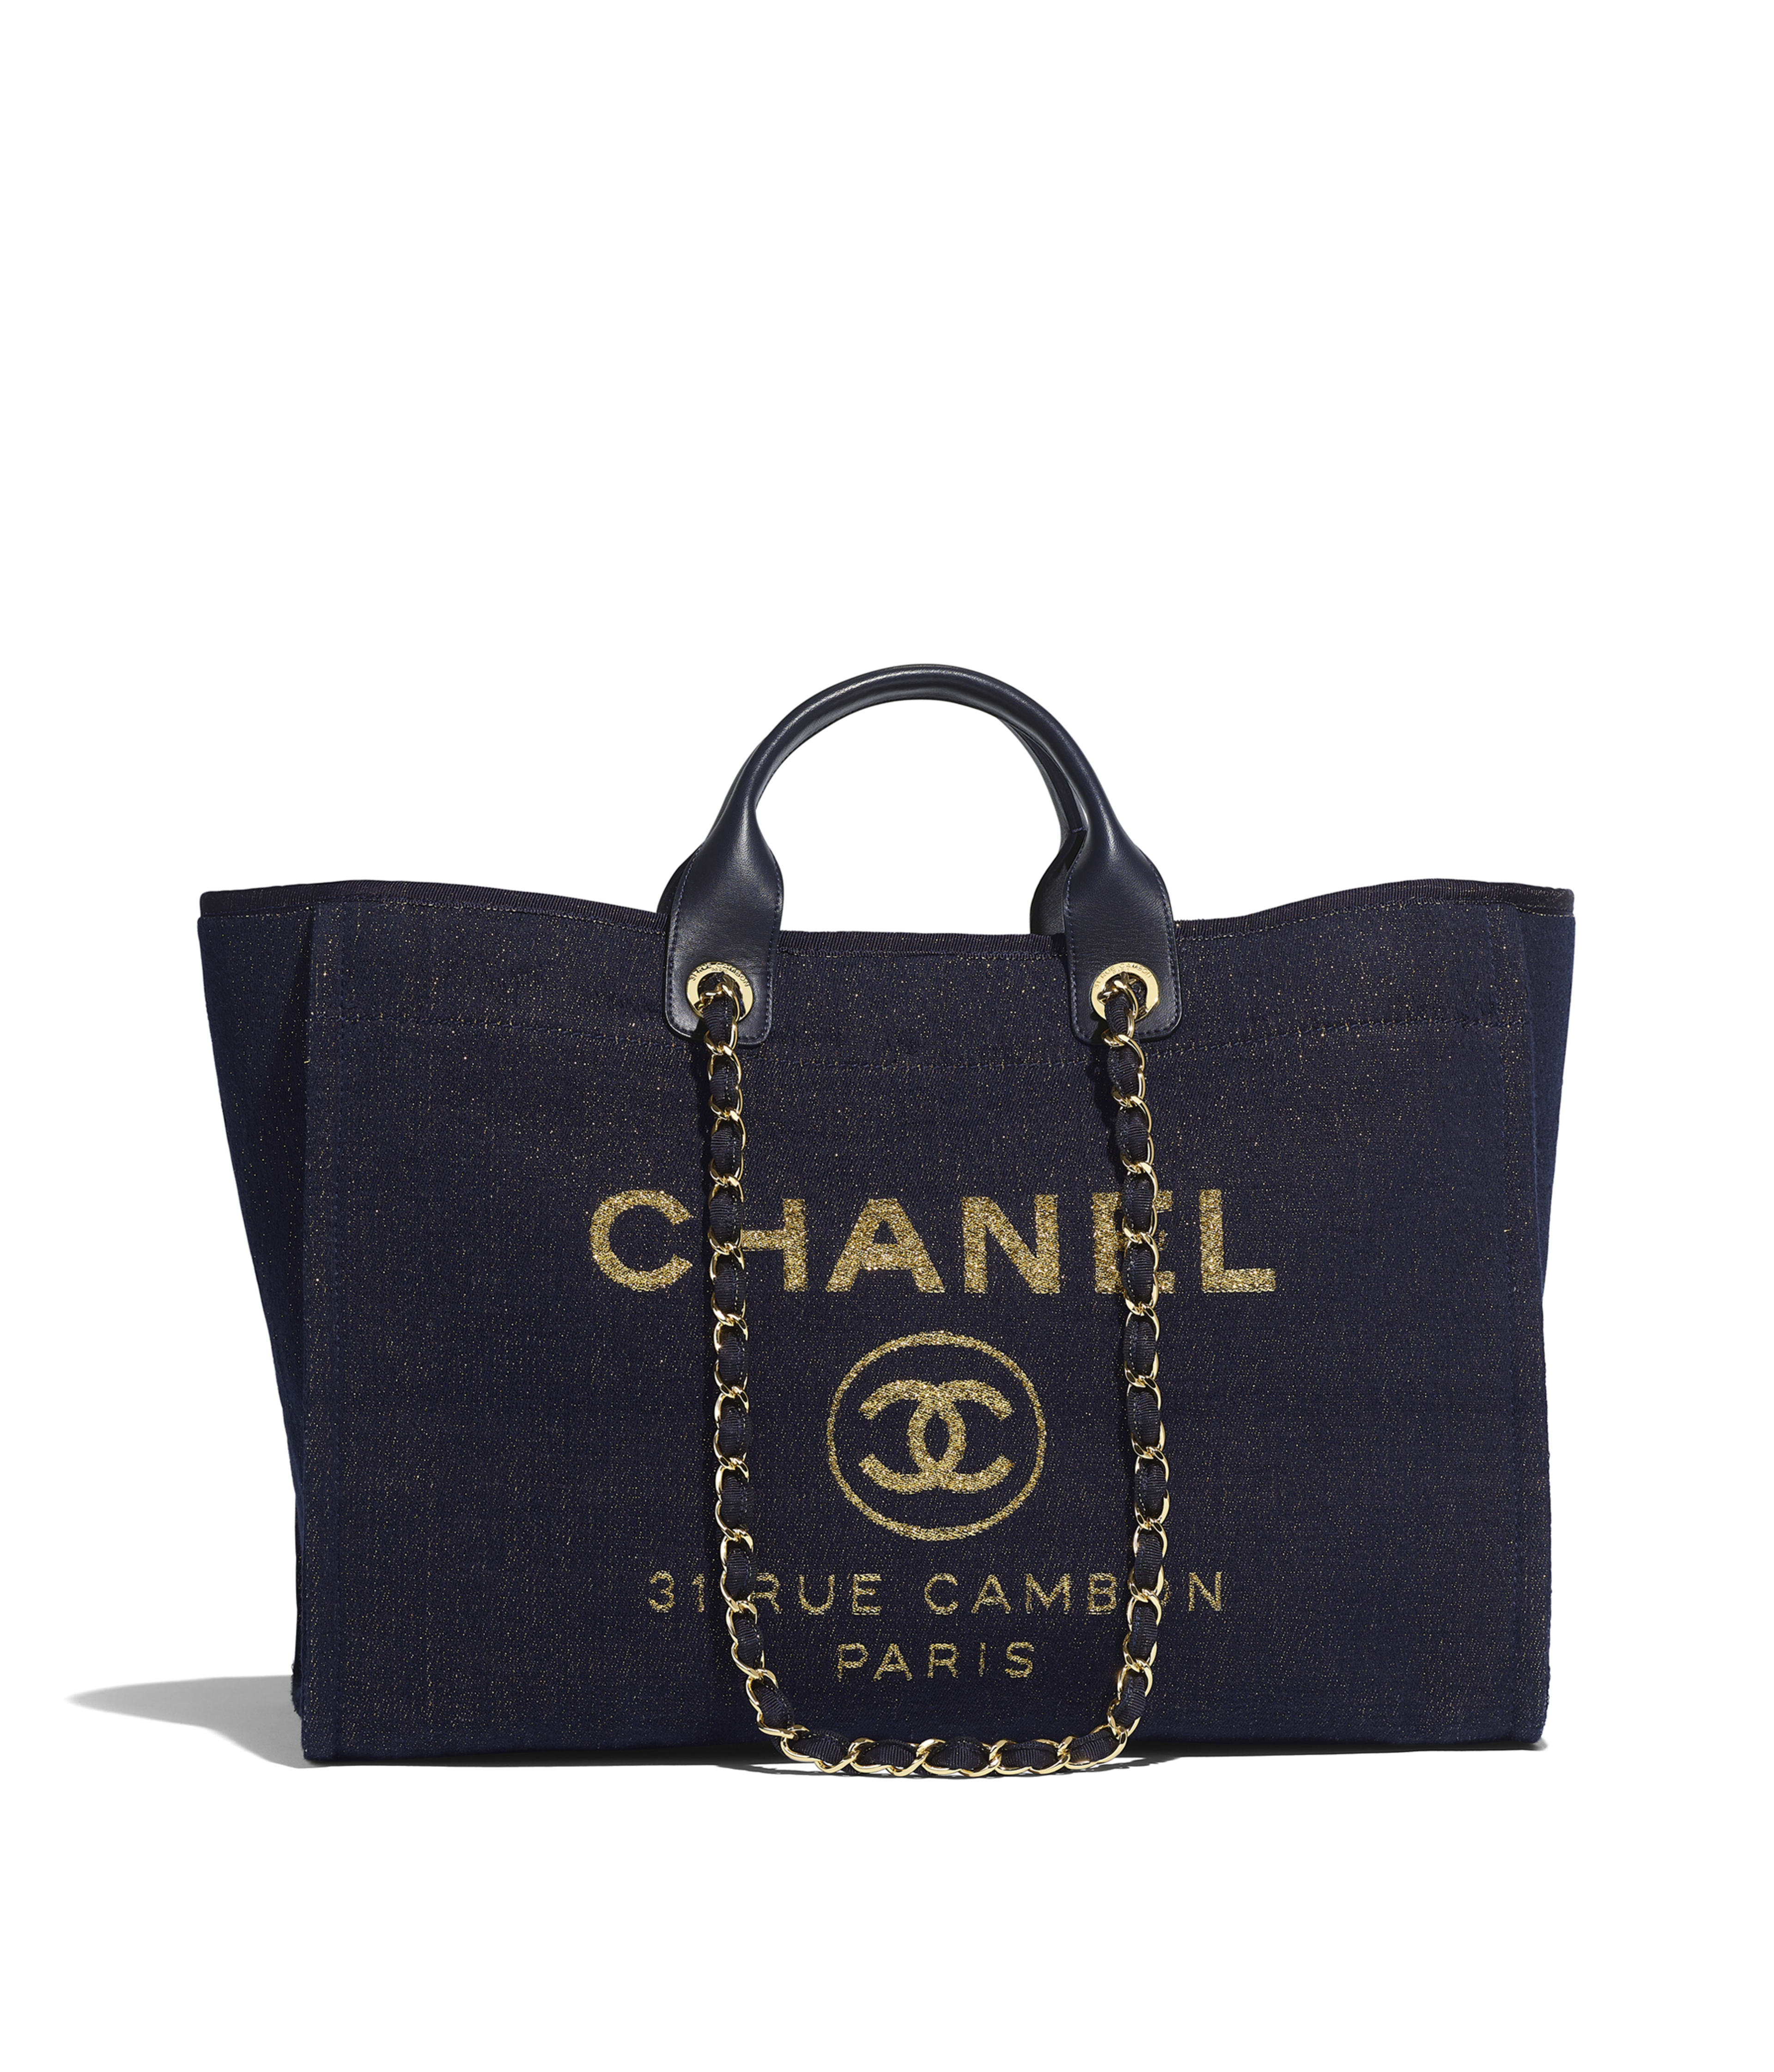 4108f390d58 Shopping Bags - Handbags | CHANEL